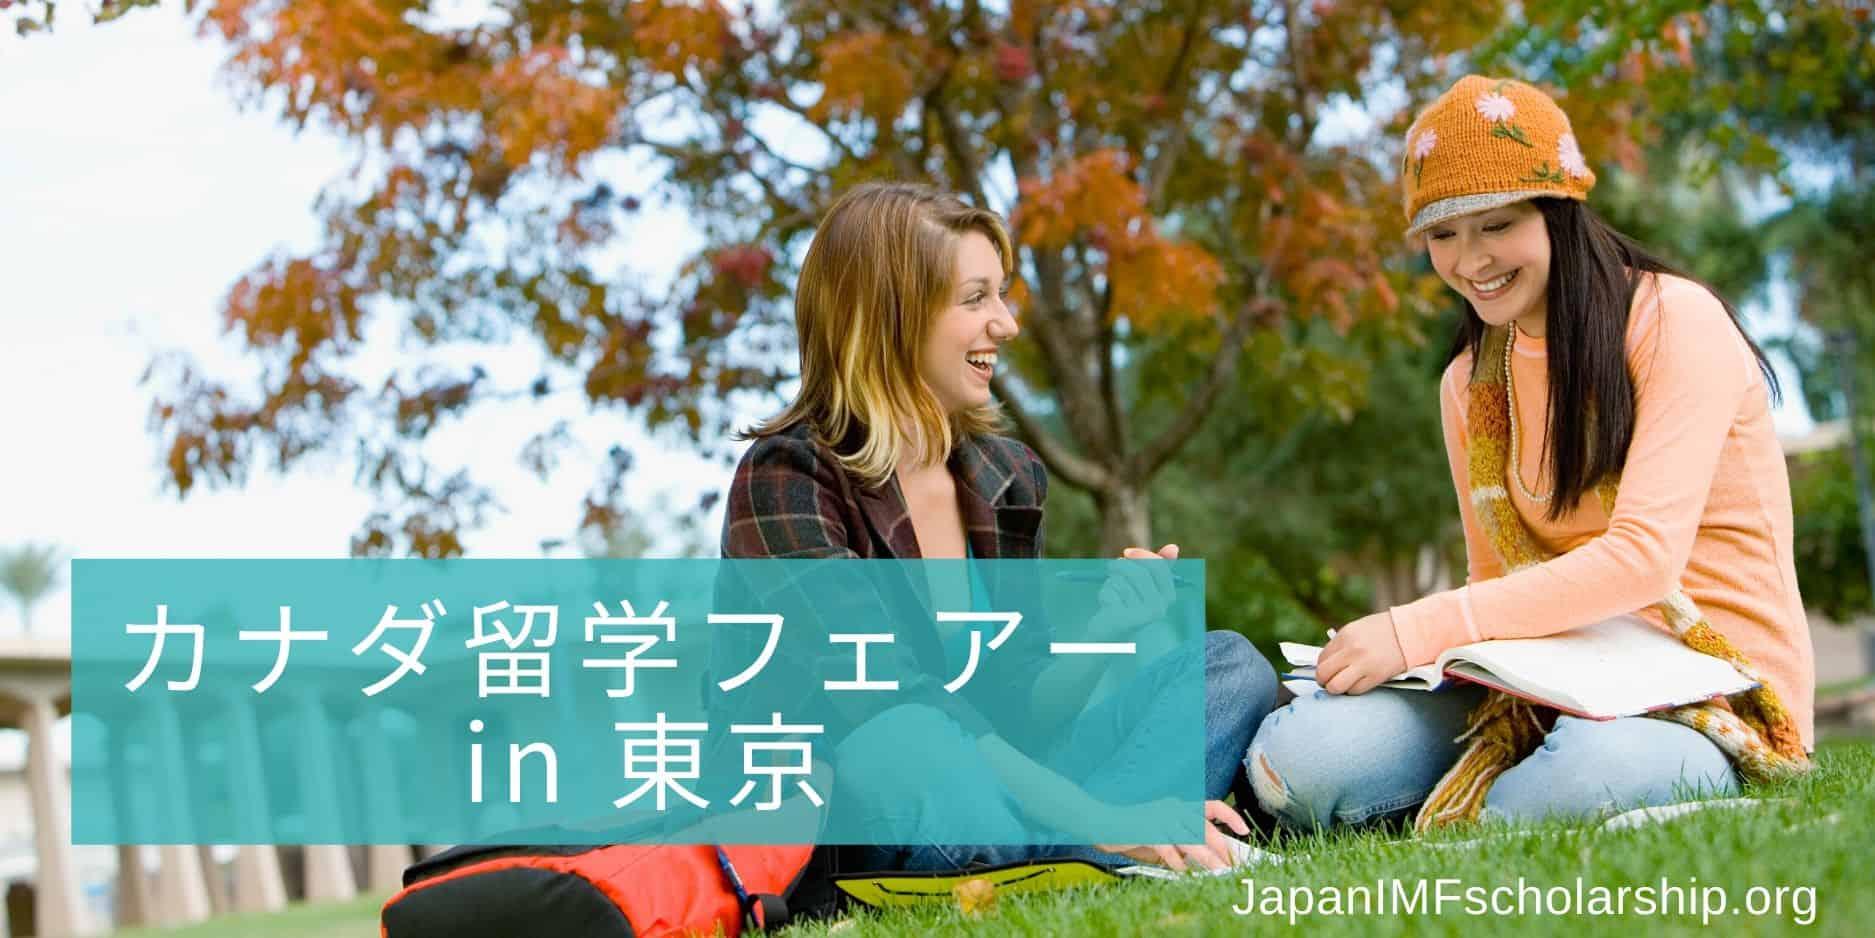 jisp web-fb abroad informations by canada education fair in tokyo